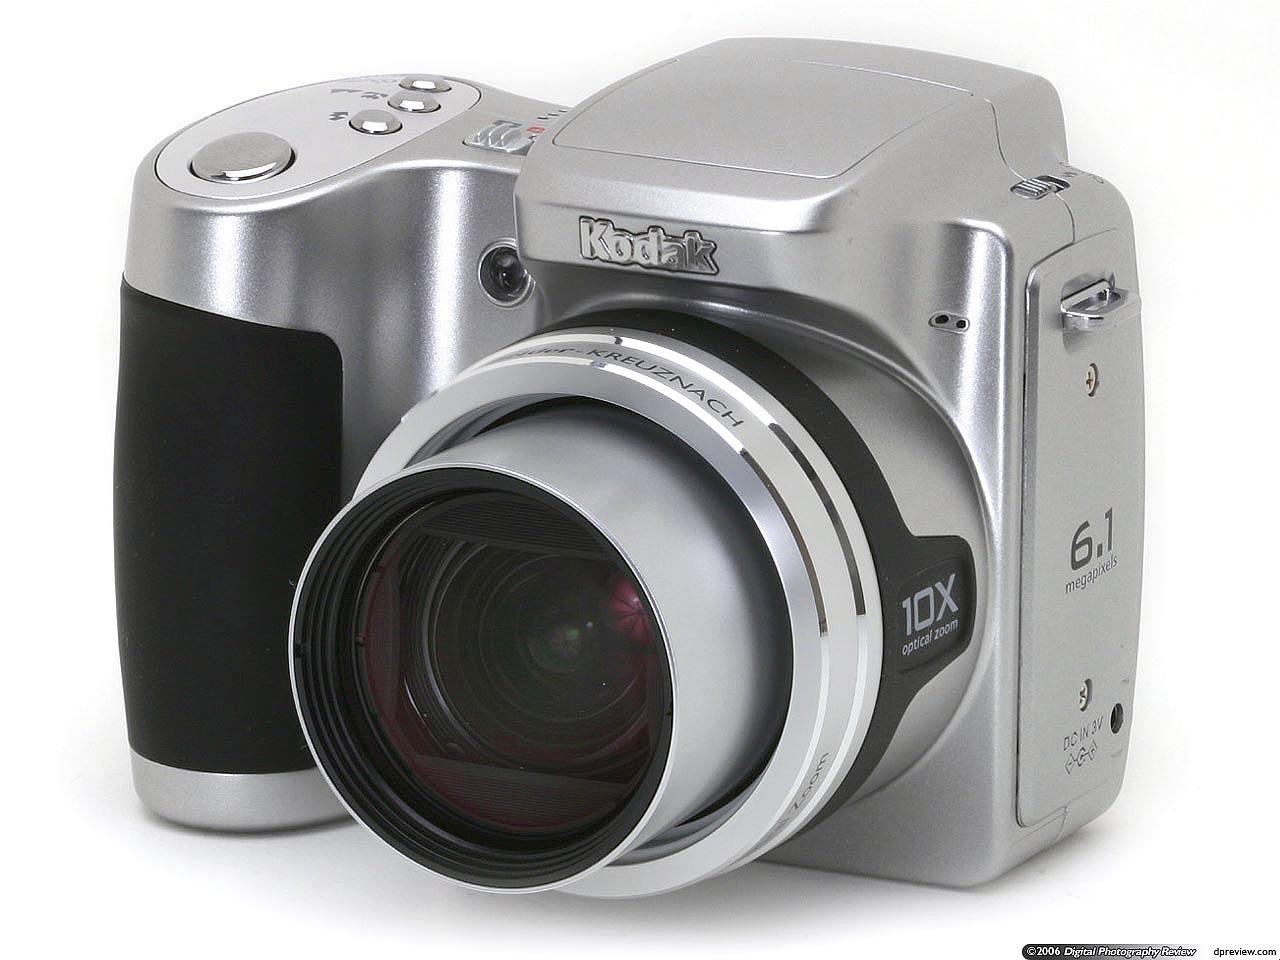 kodak easyshare z650 review digital photography review rh dpreview com kodak easyshare z650 manual español kodak easyshare z650 manuel d'utilisation